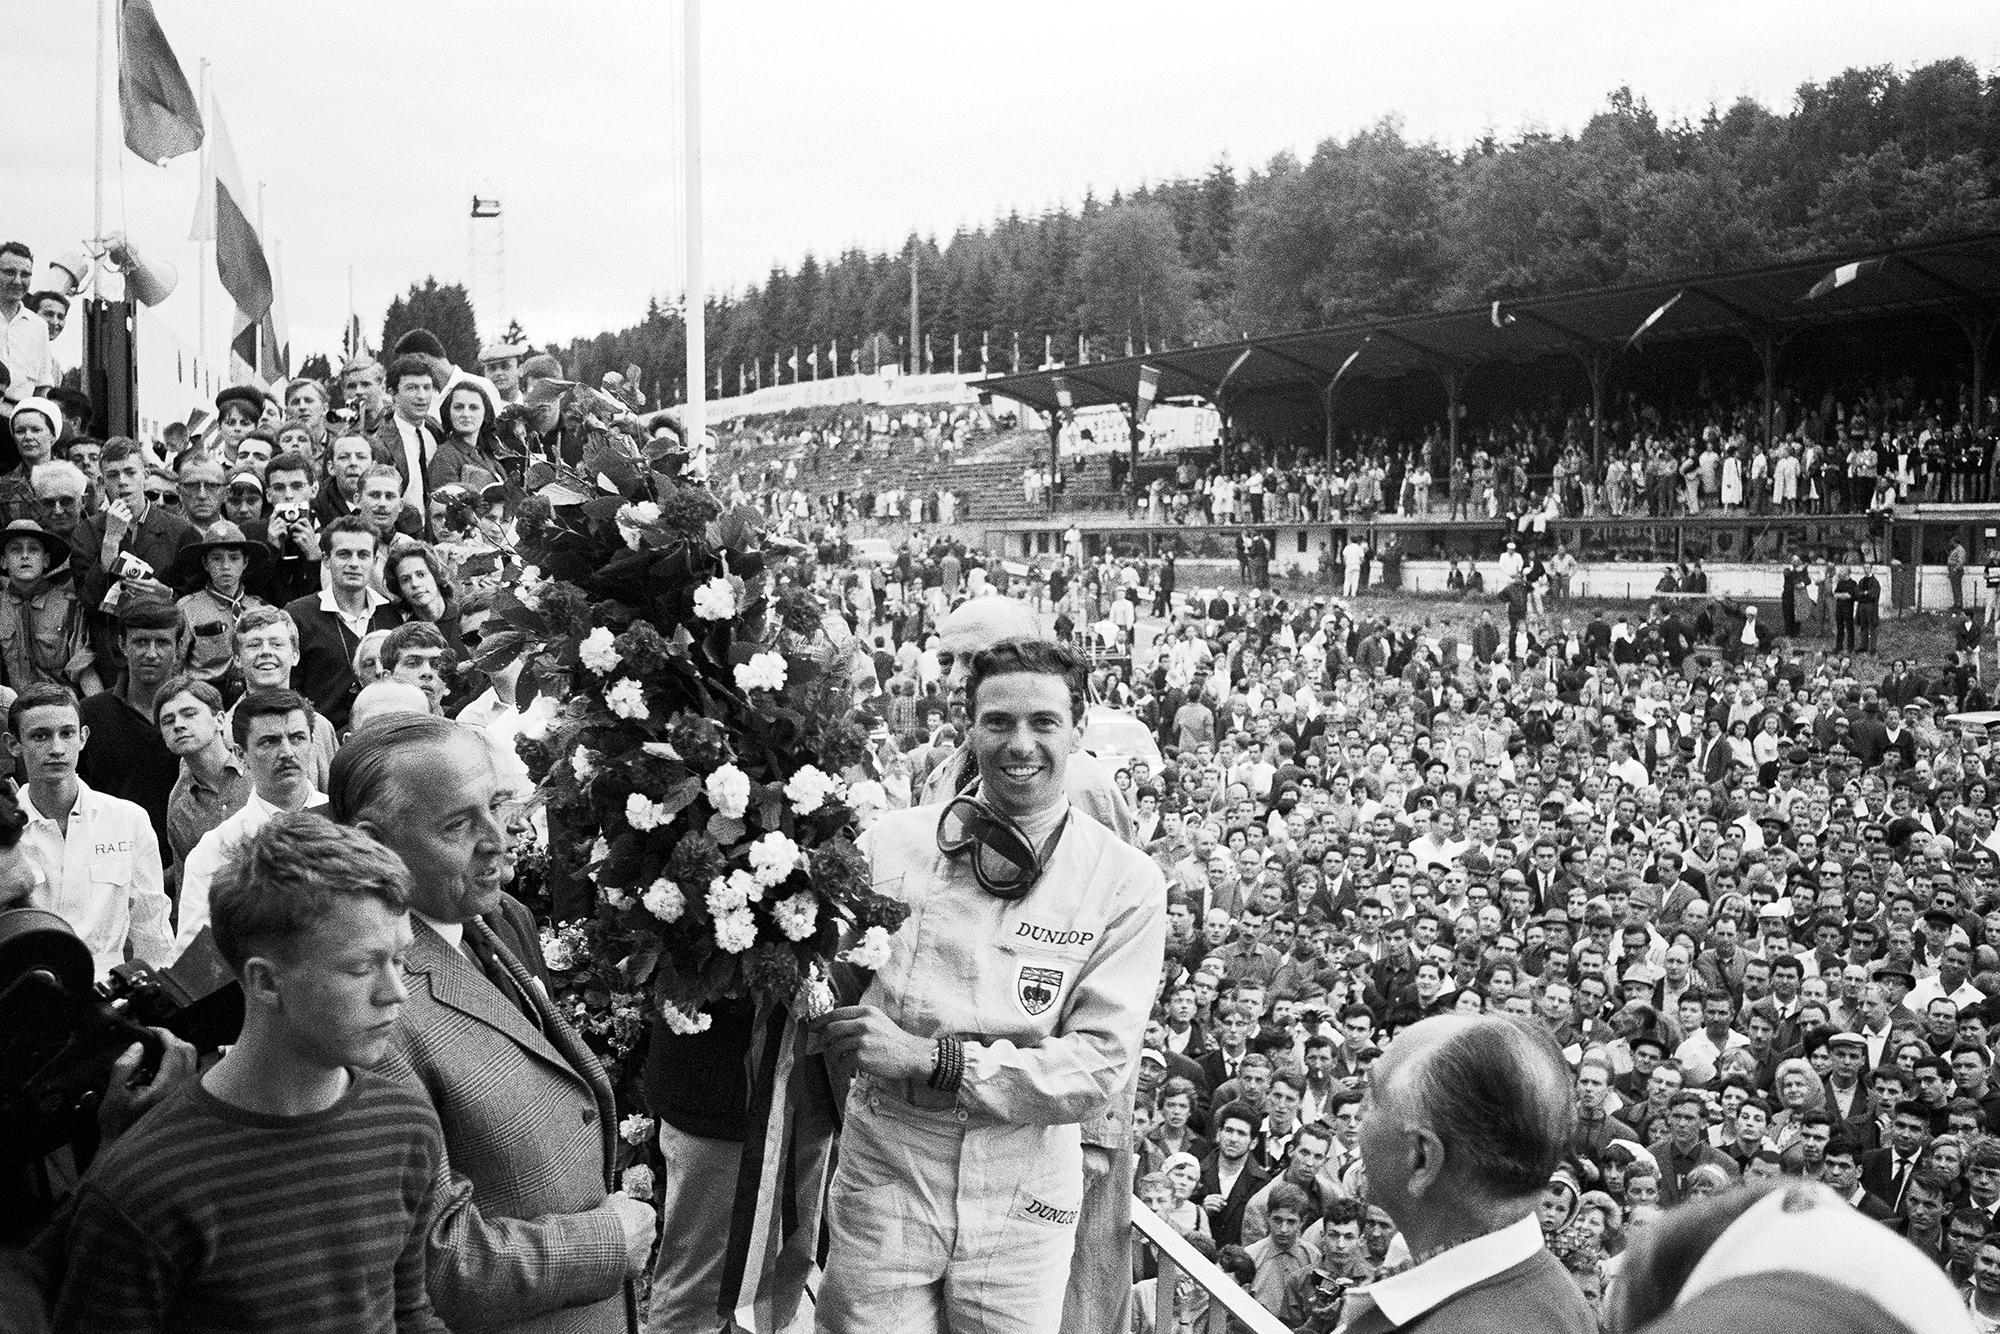 Jim Clark on the podium after winning the 1964 Belgian Grand Prix.